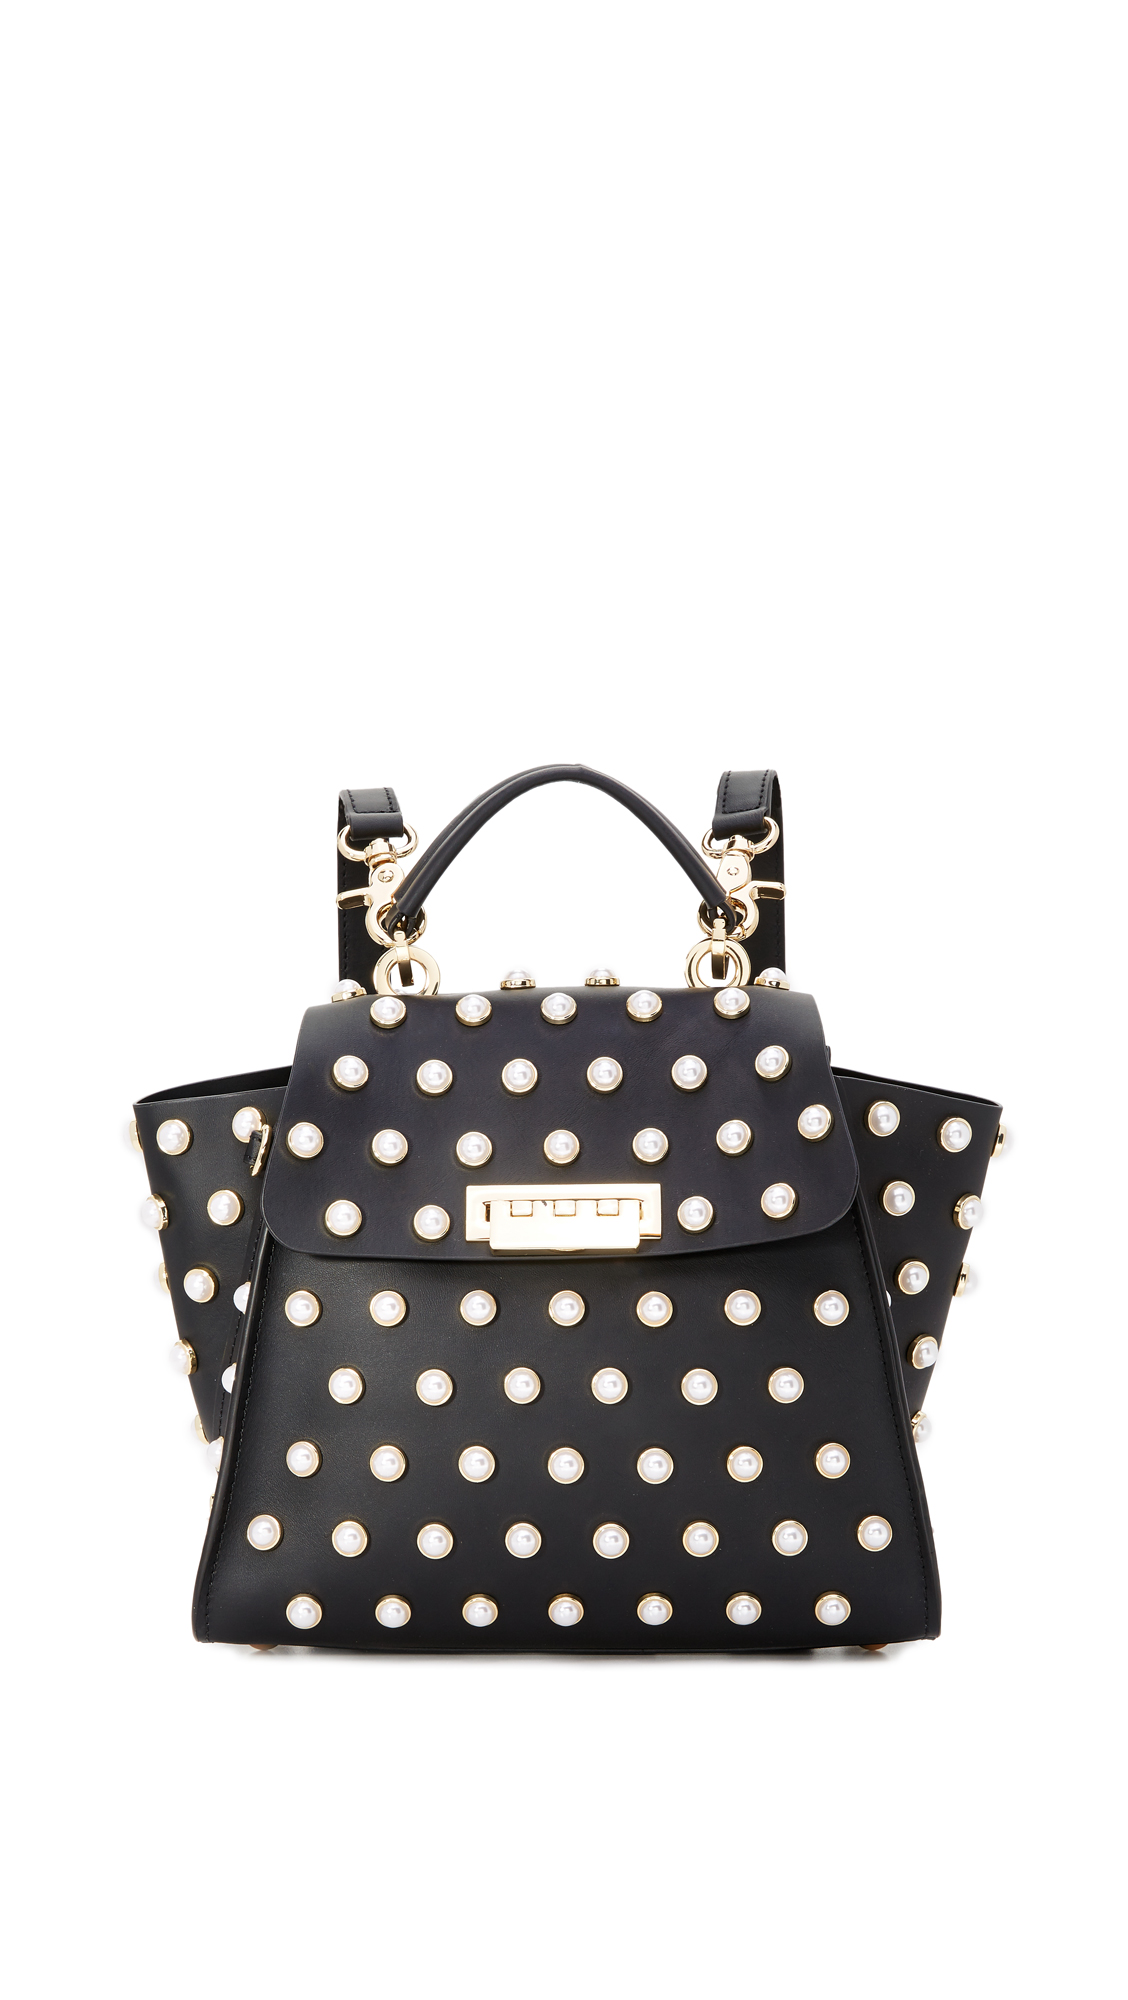 ZAC Zac Posen Eartha Imitation Pearl Lady Convertible Backpack - Black